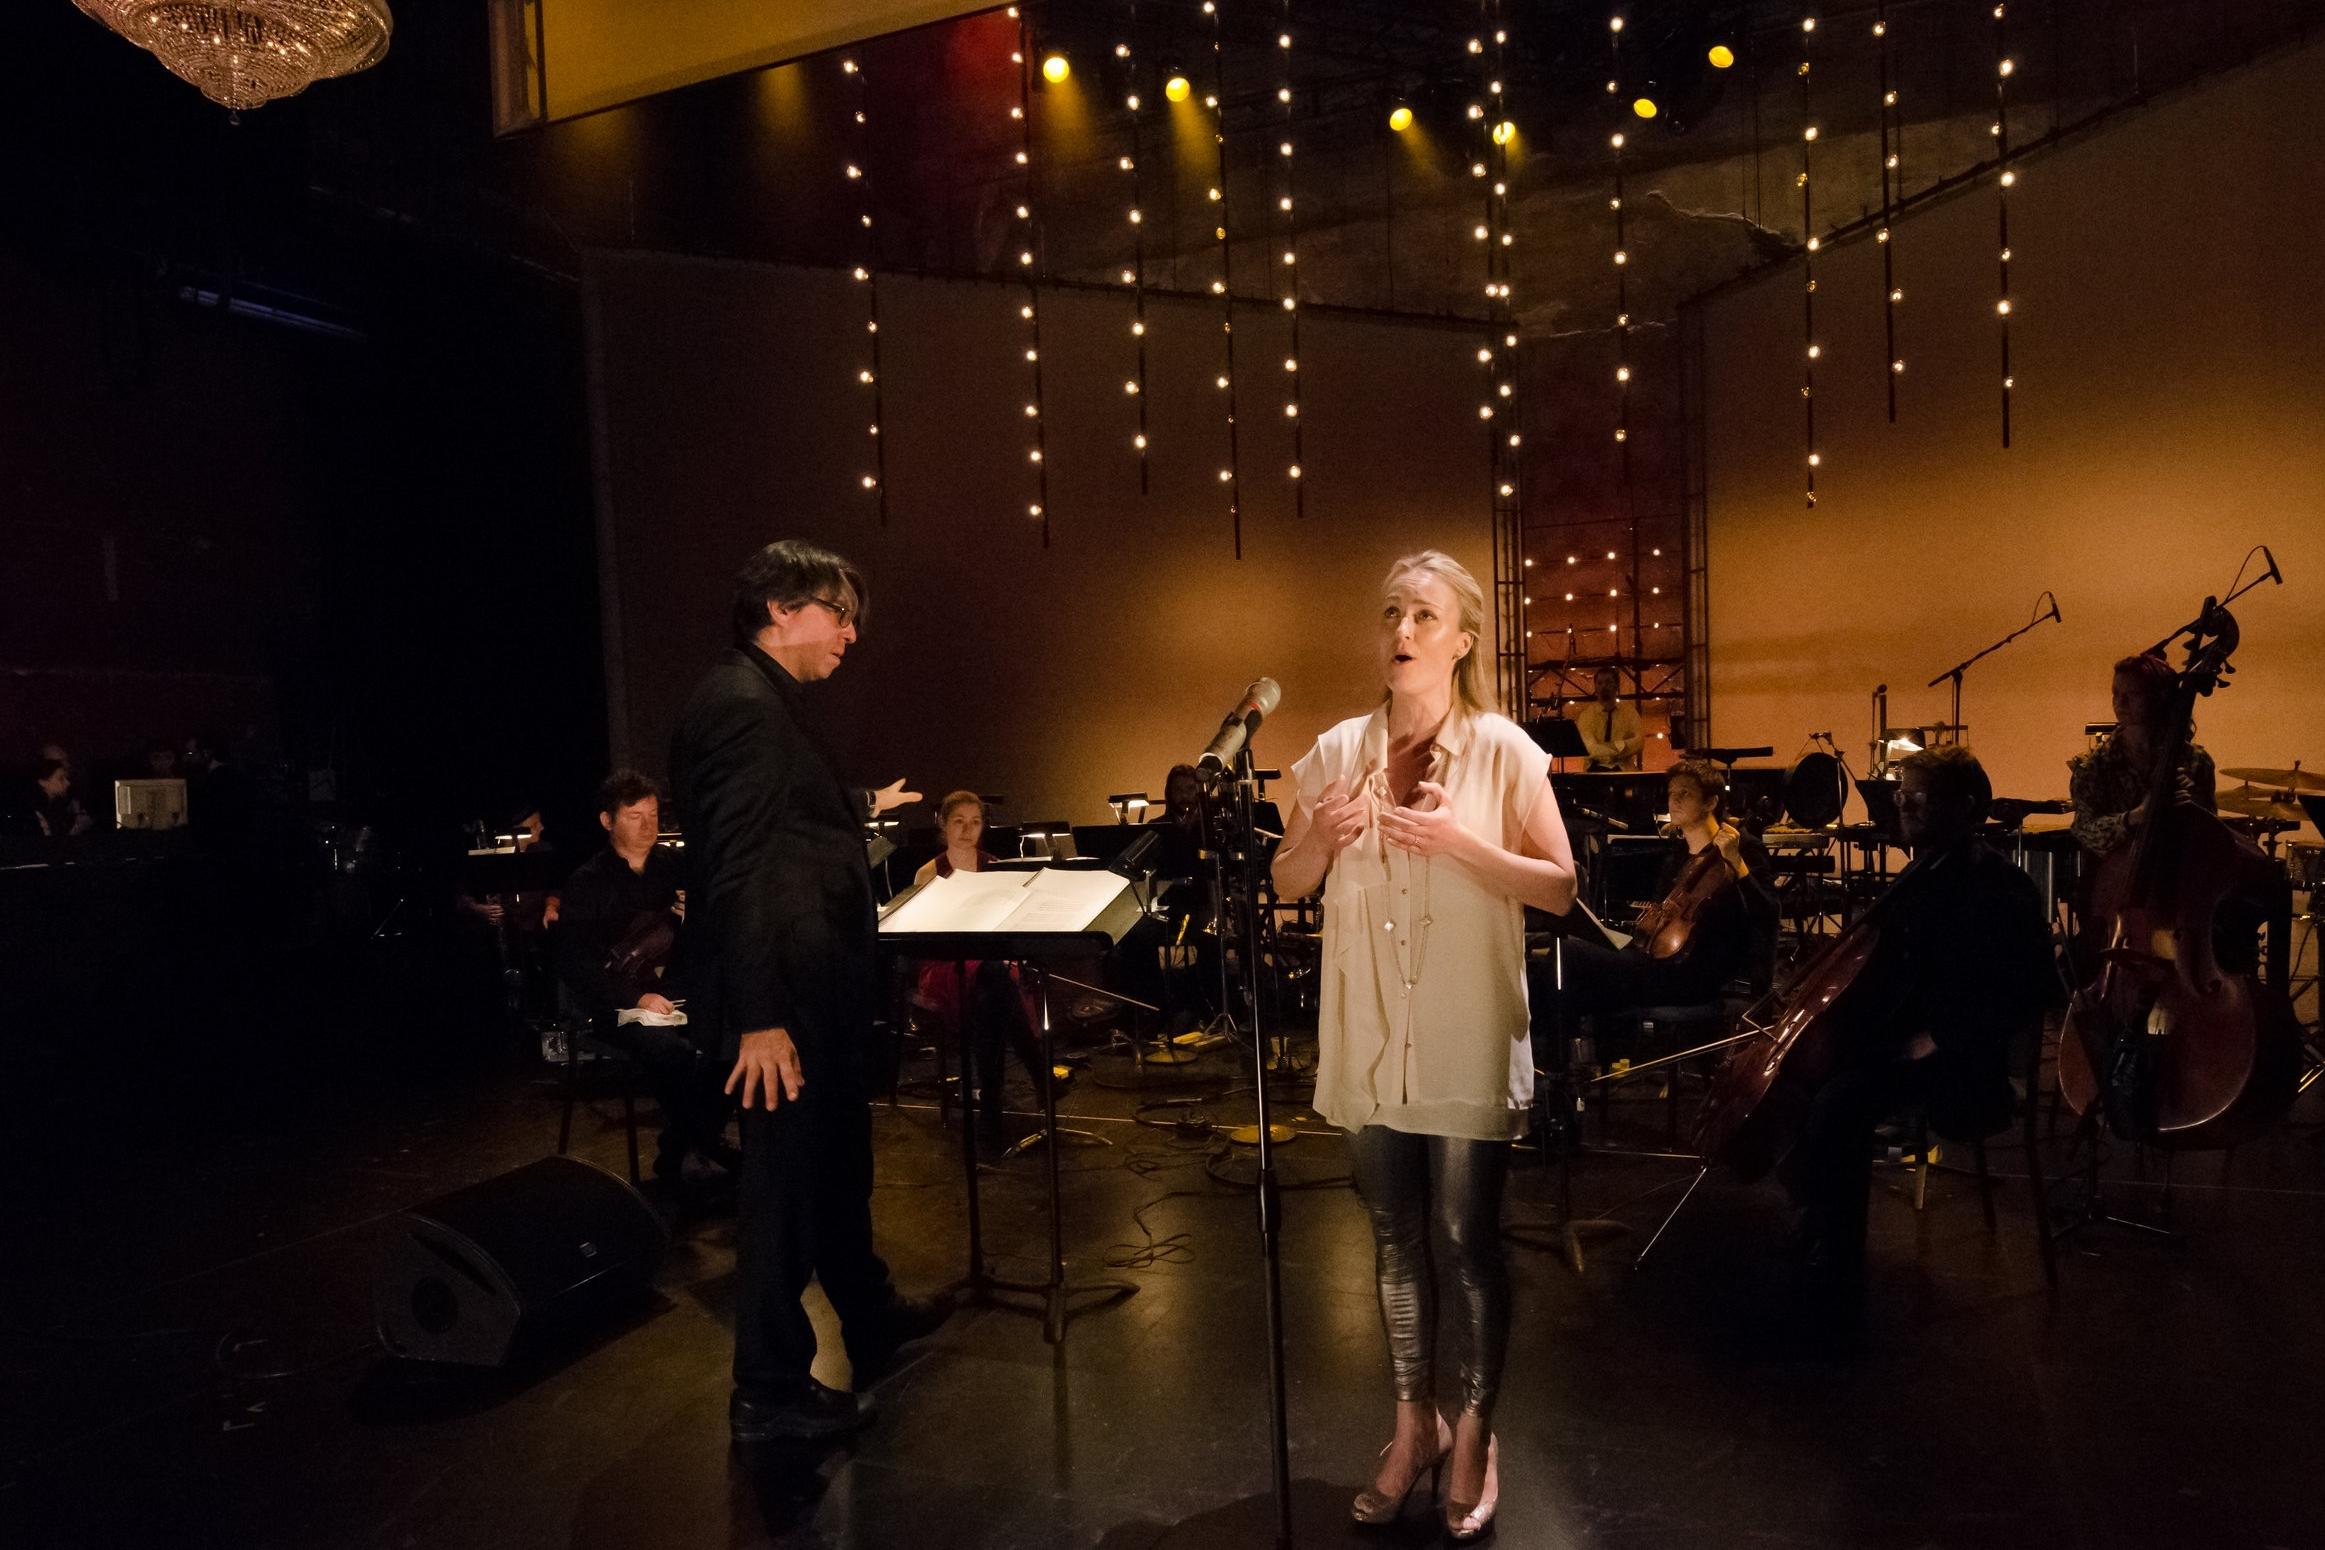 Liederabend at BAM Julian Wachner, conductor Photo credit: Jill Steinberg